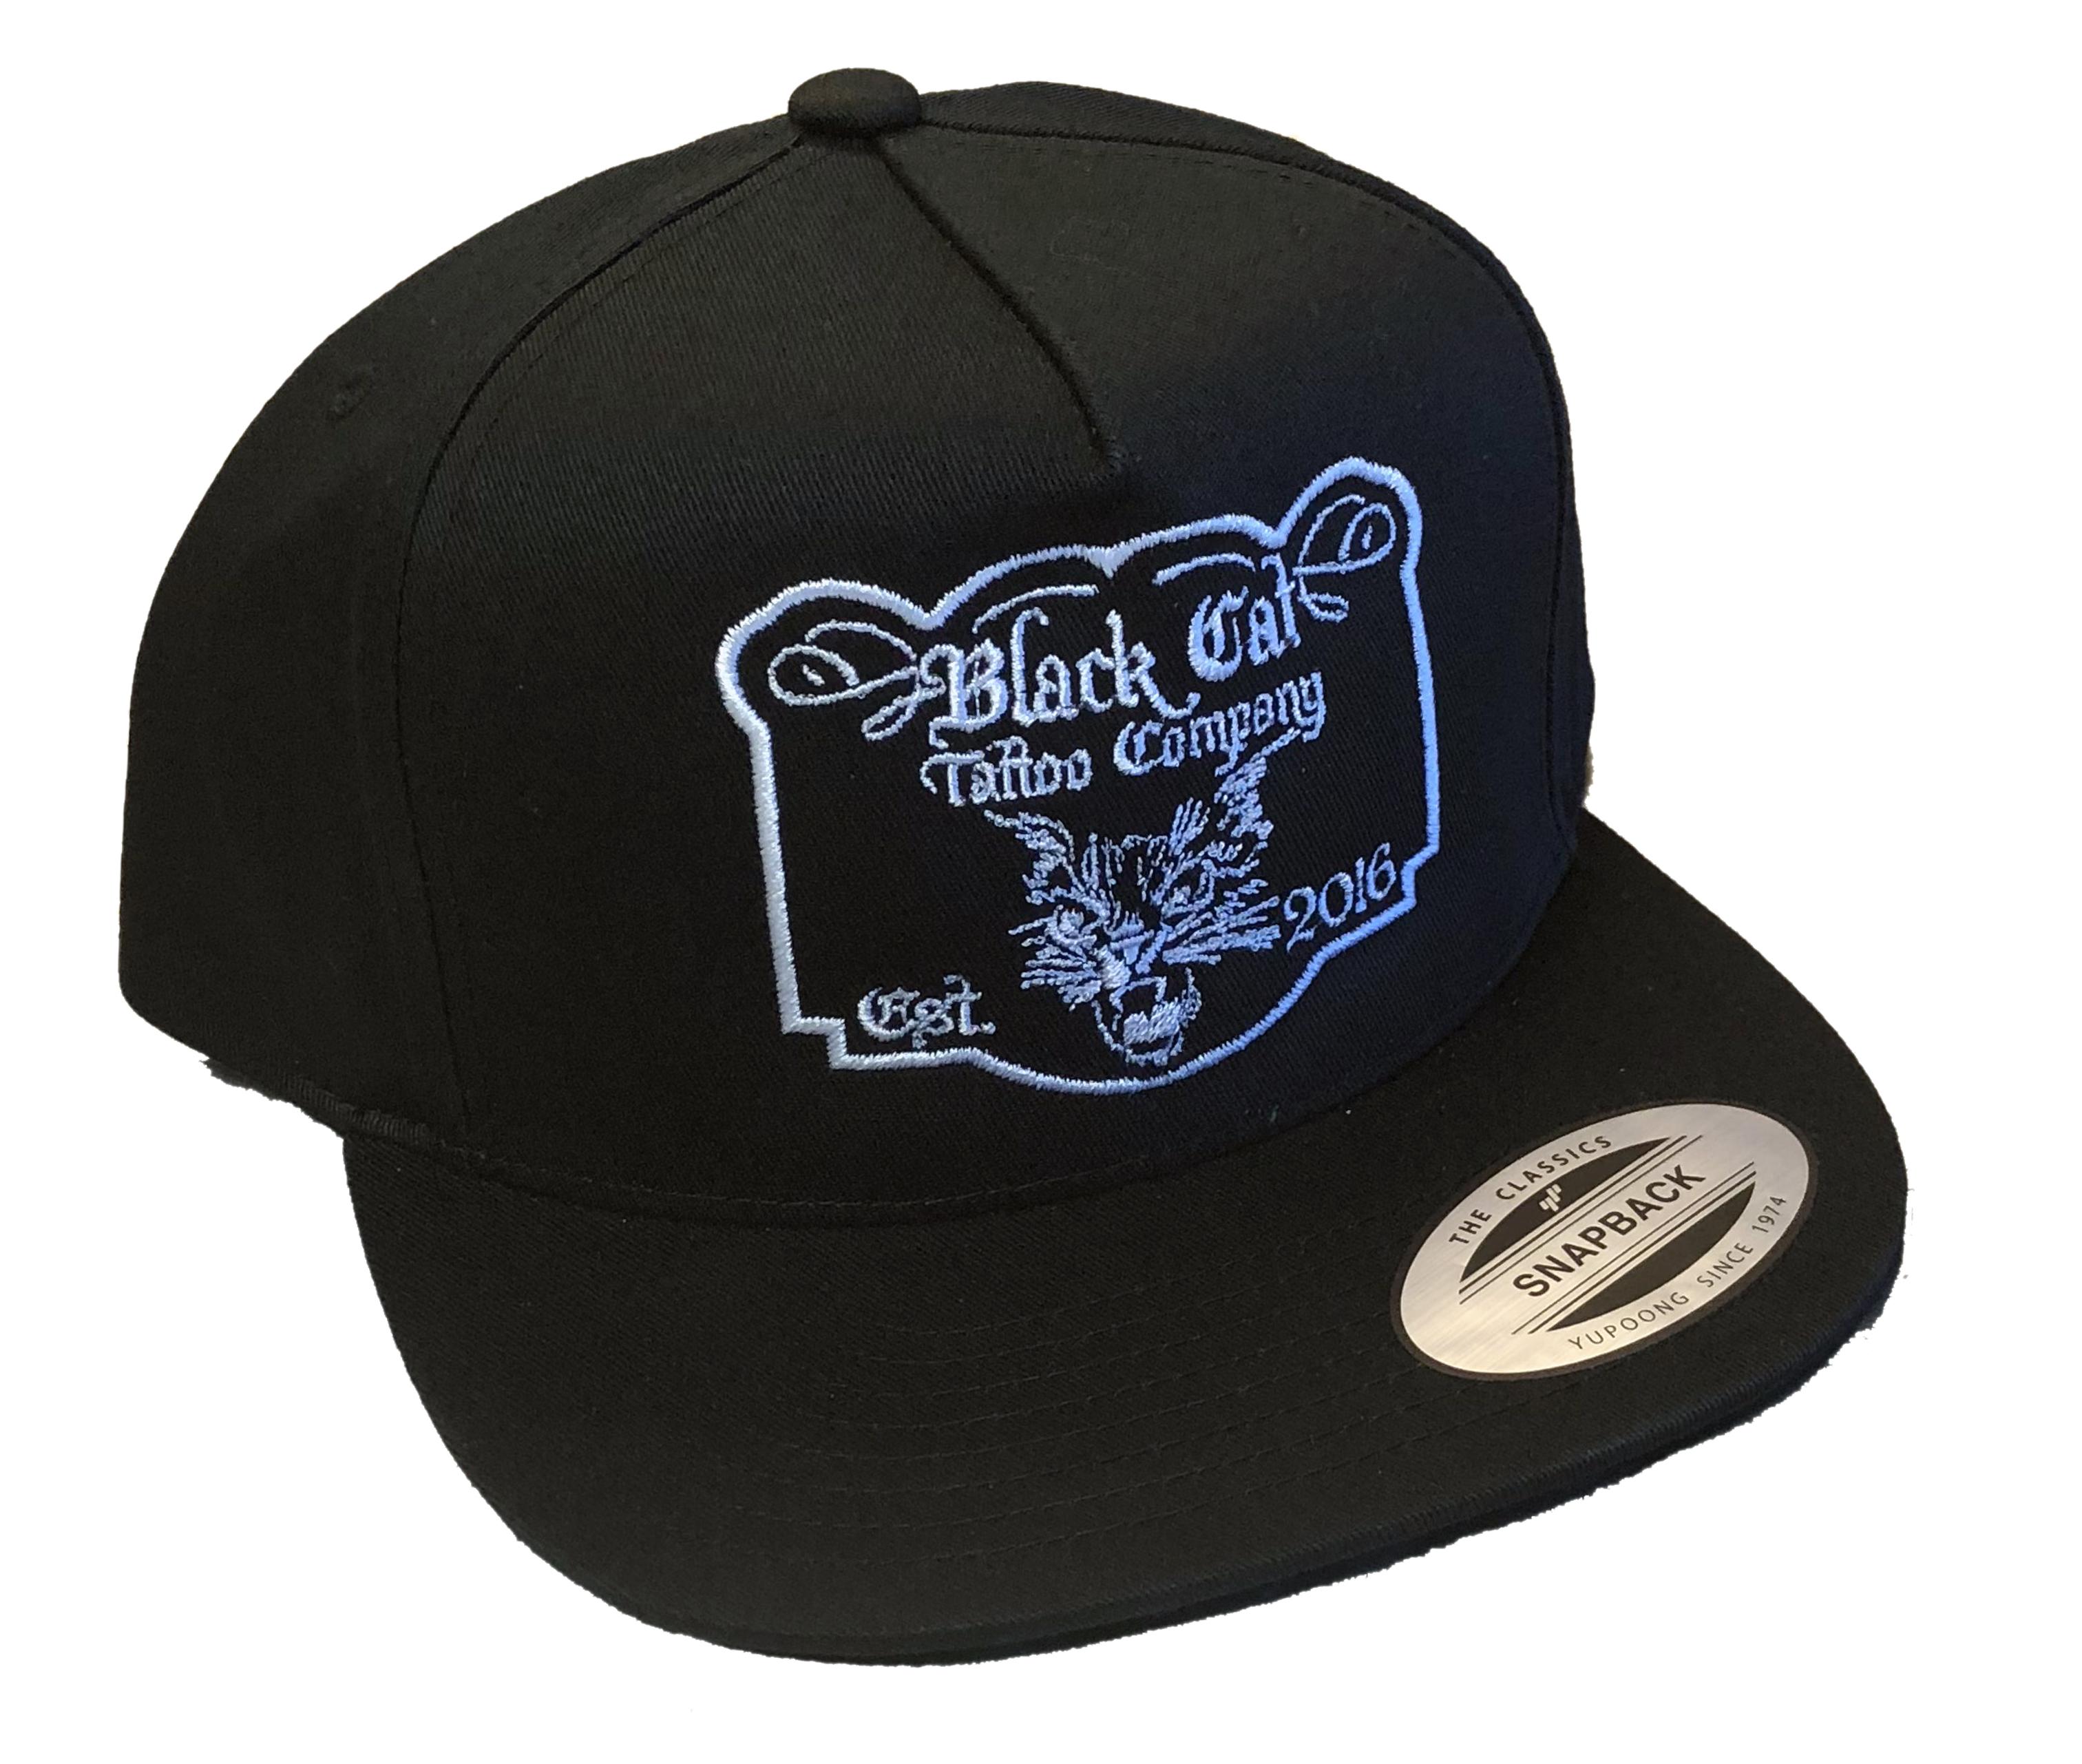 Black Cat Snapback · Black Cat Tattoo Company · Online Store Powered ... e10e0cd128d